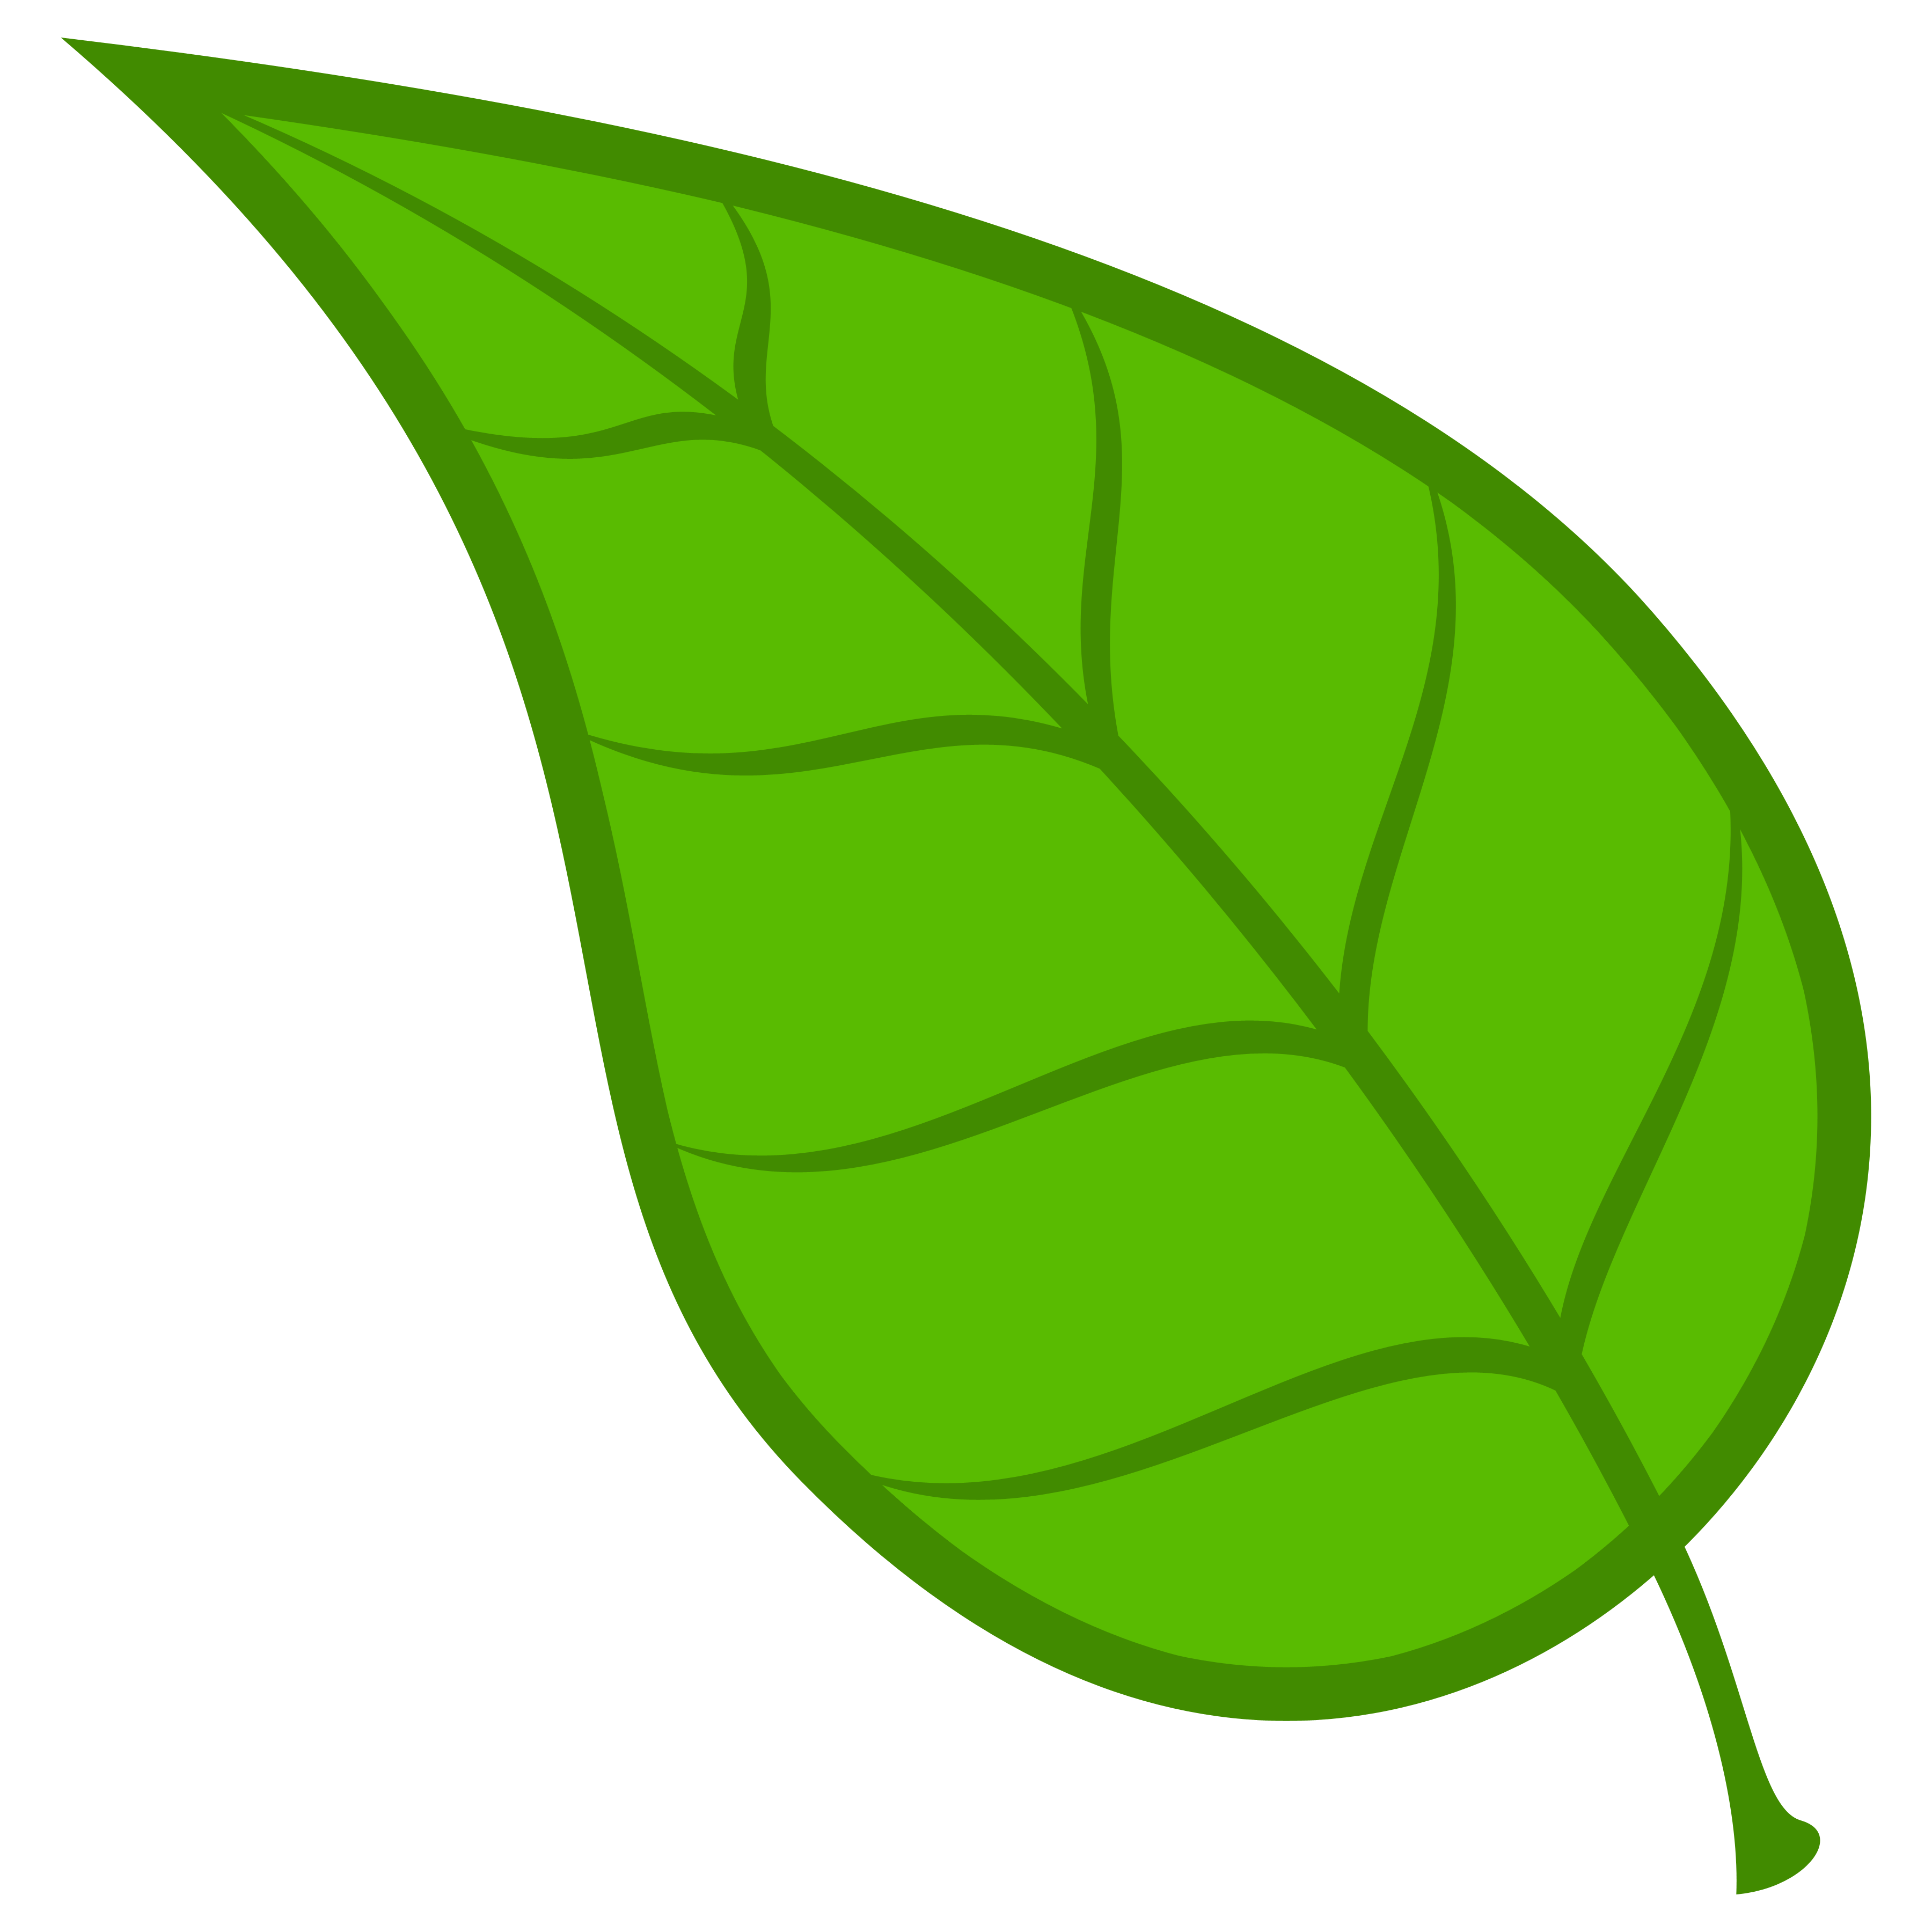 Green leaf clipart #17